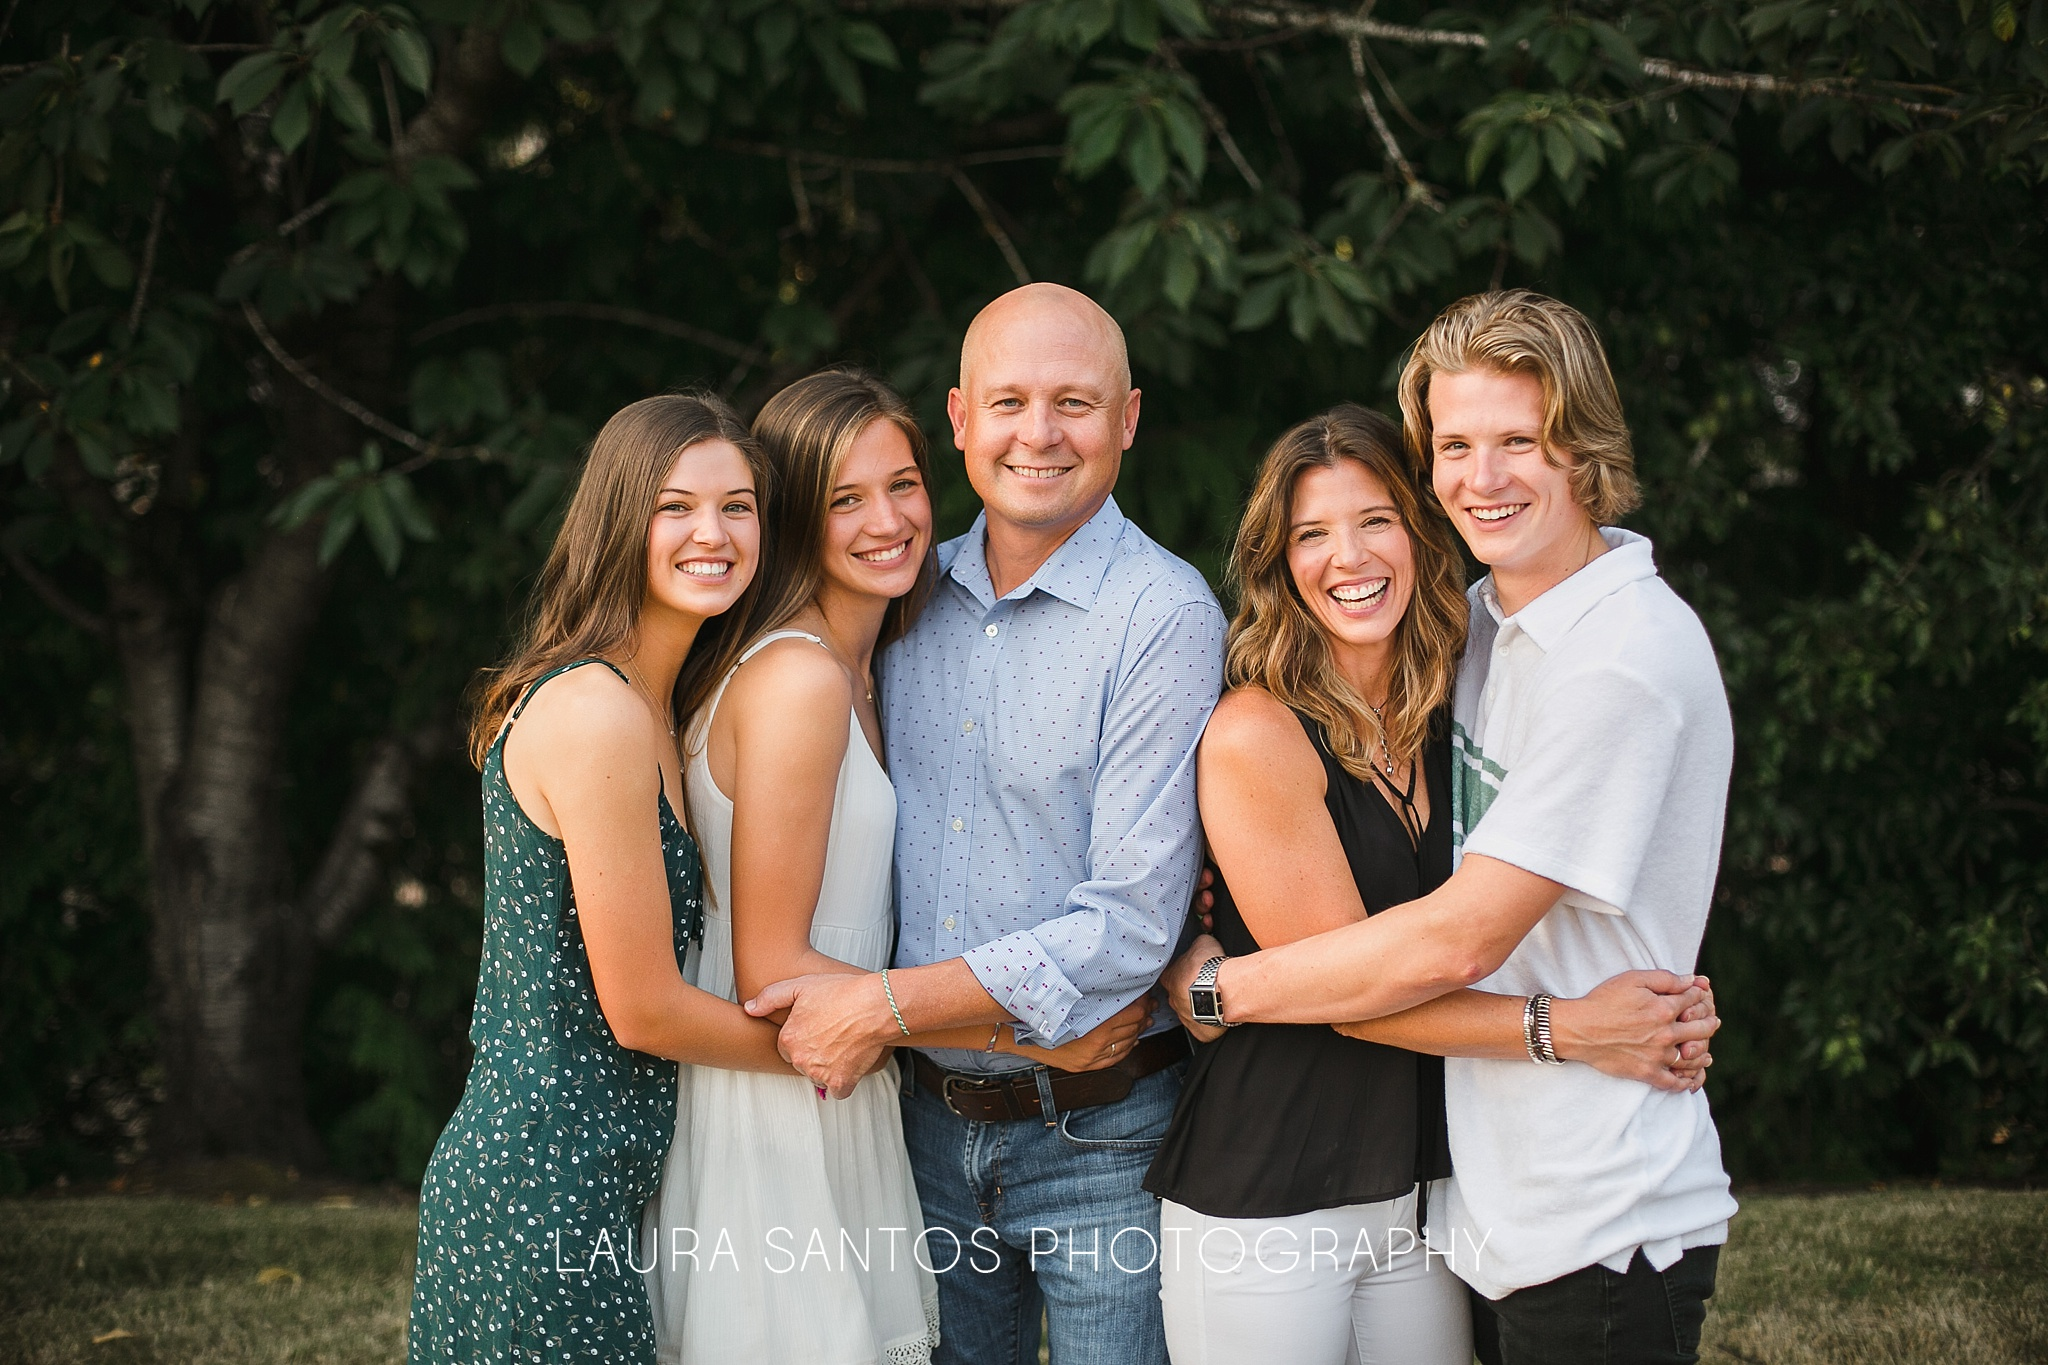 Laura Santos Photography Portland Oregon Family Photographer_0250.jpg